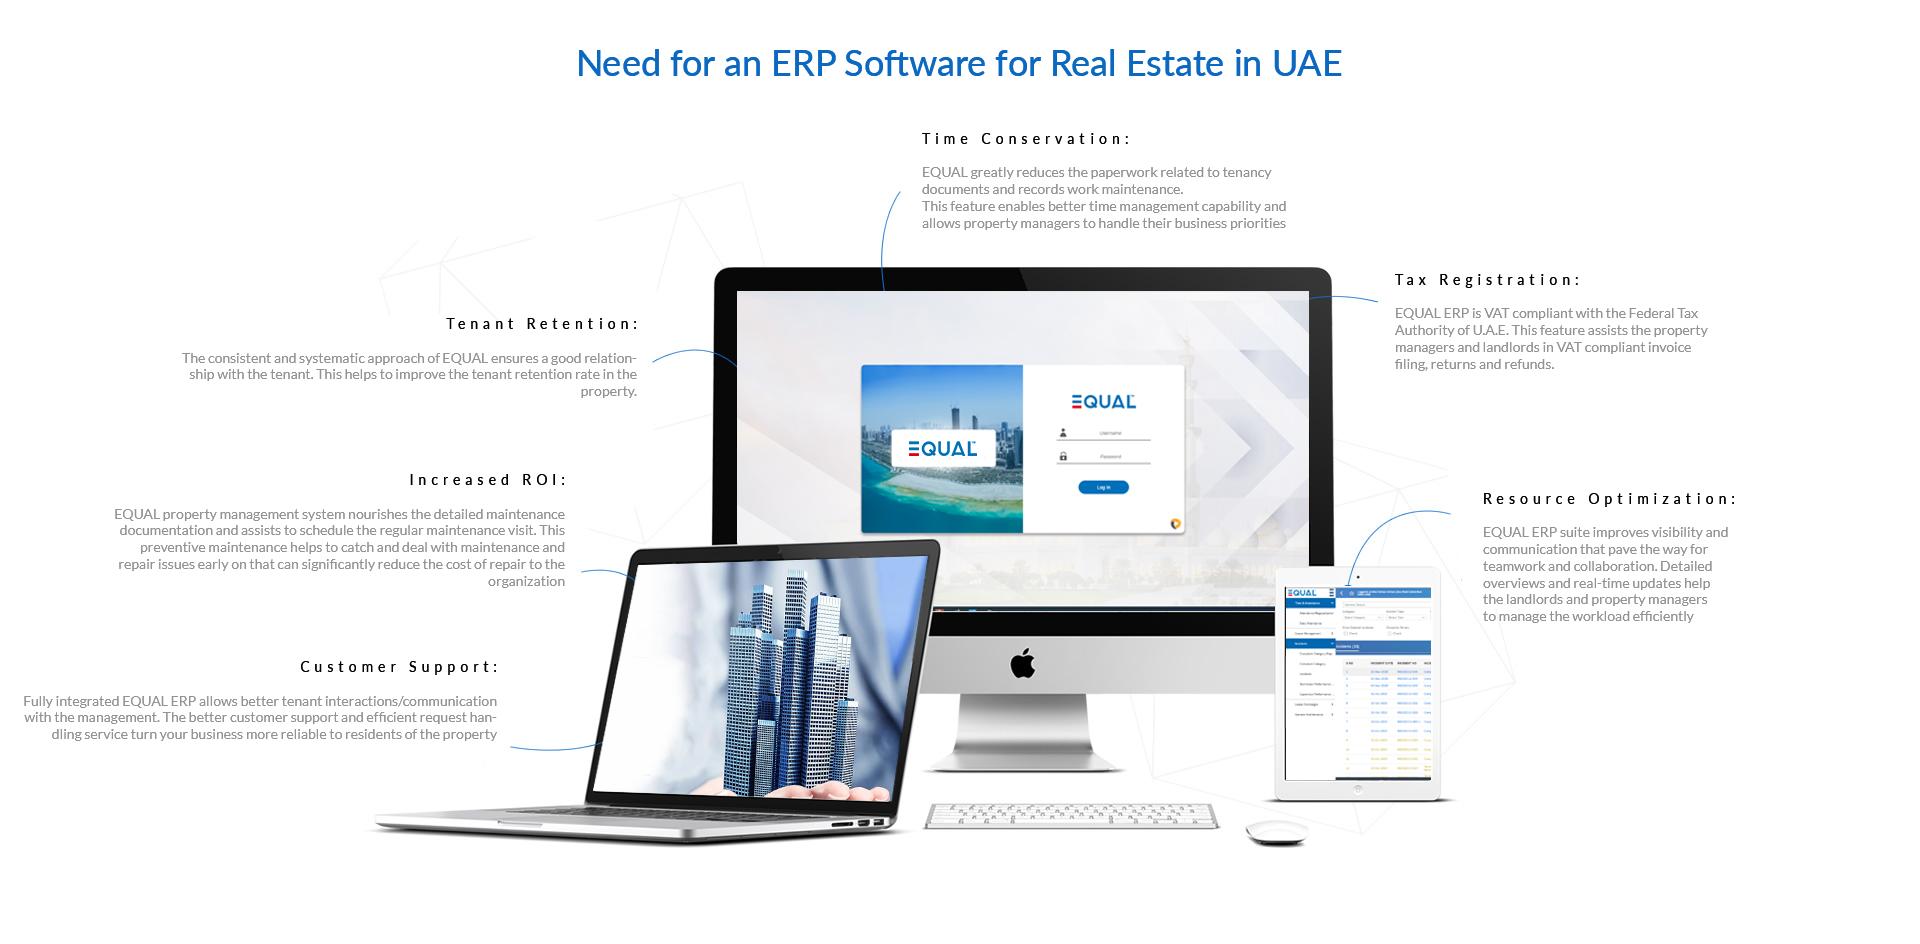 Real Estate management Software in UAE